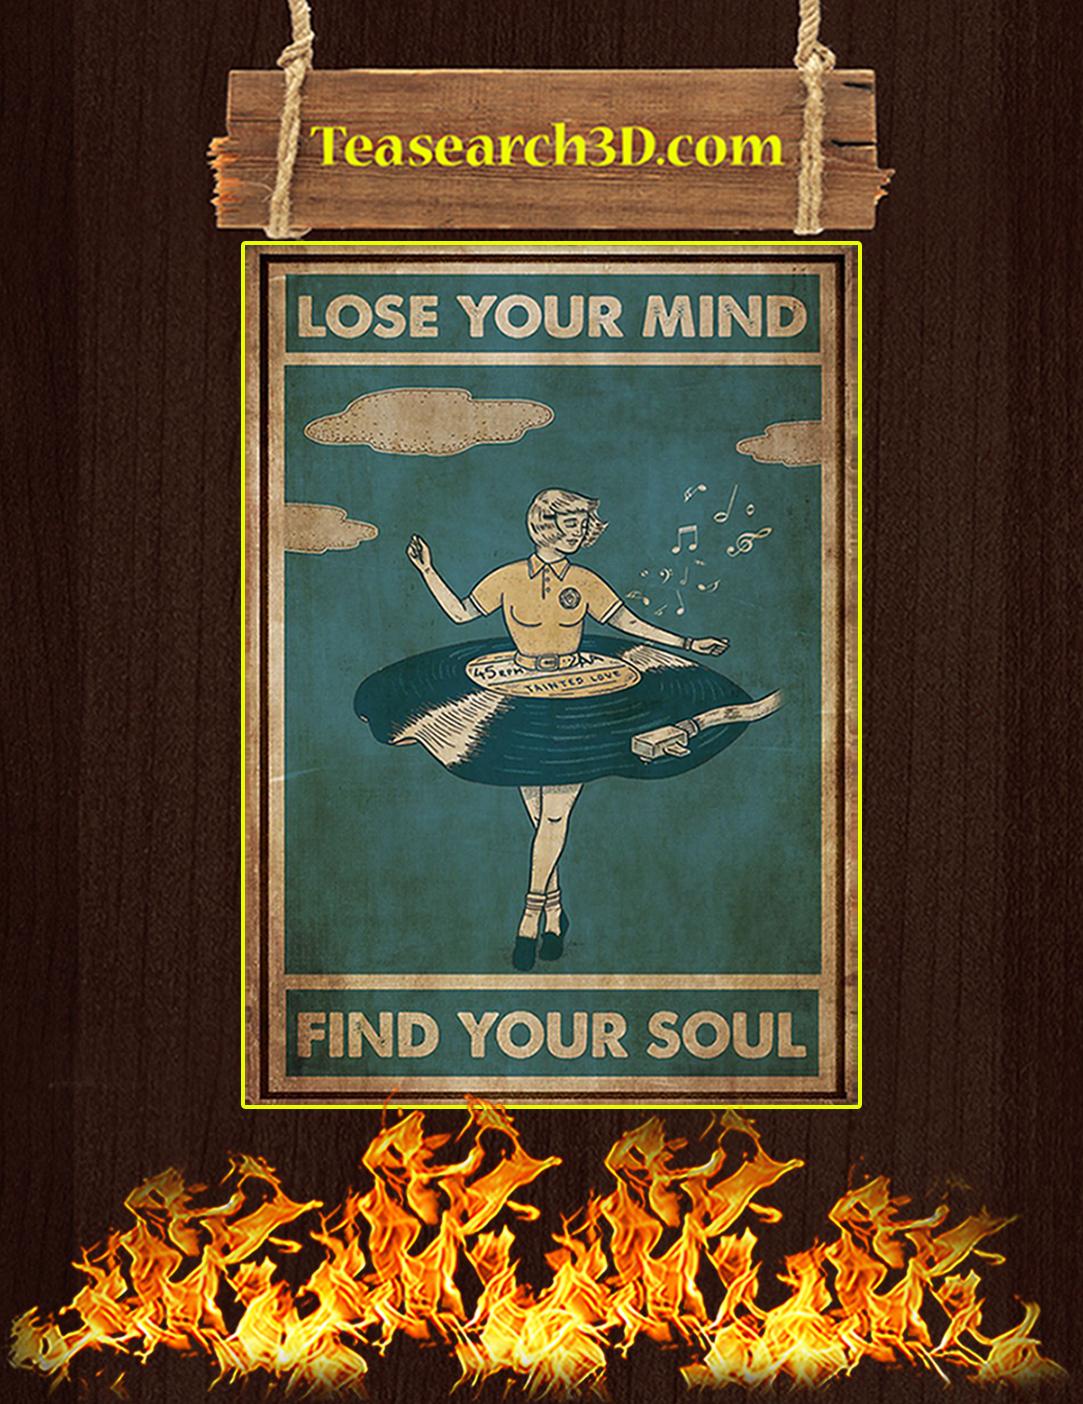 Vinyl dress lose your mind find your soul poster A2